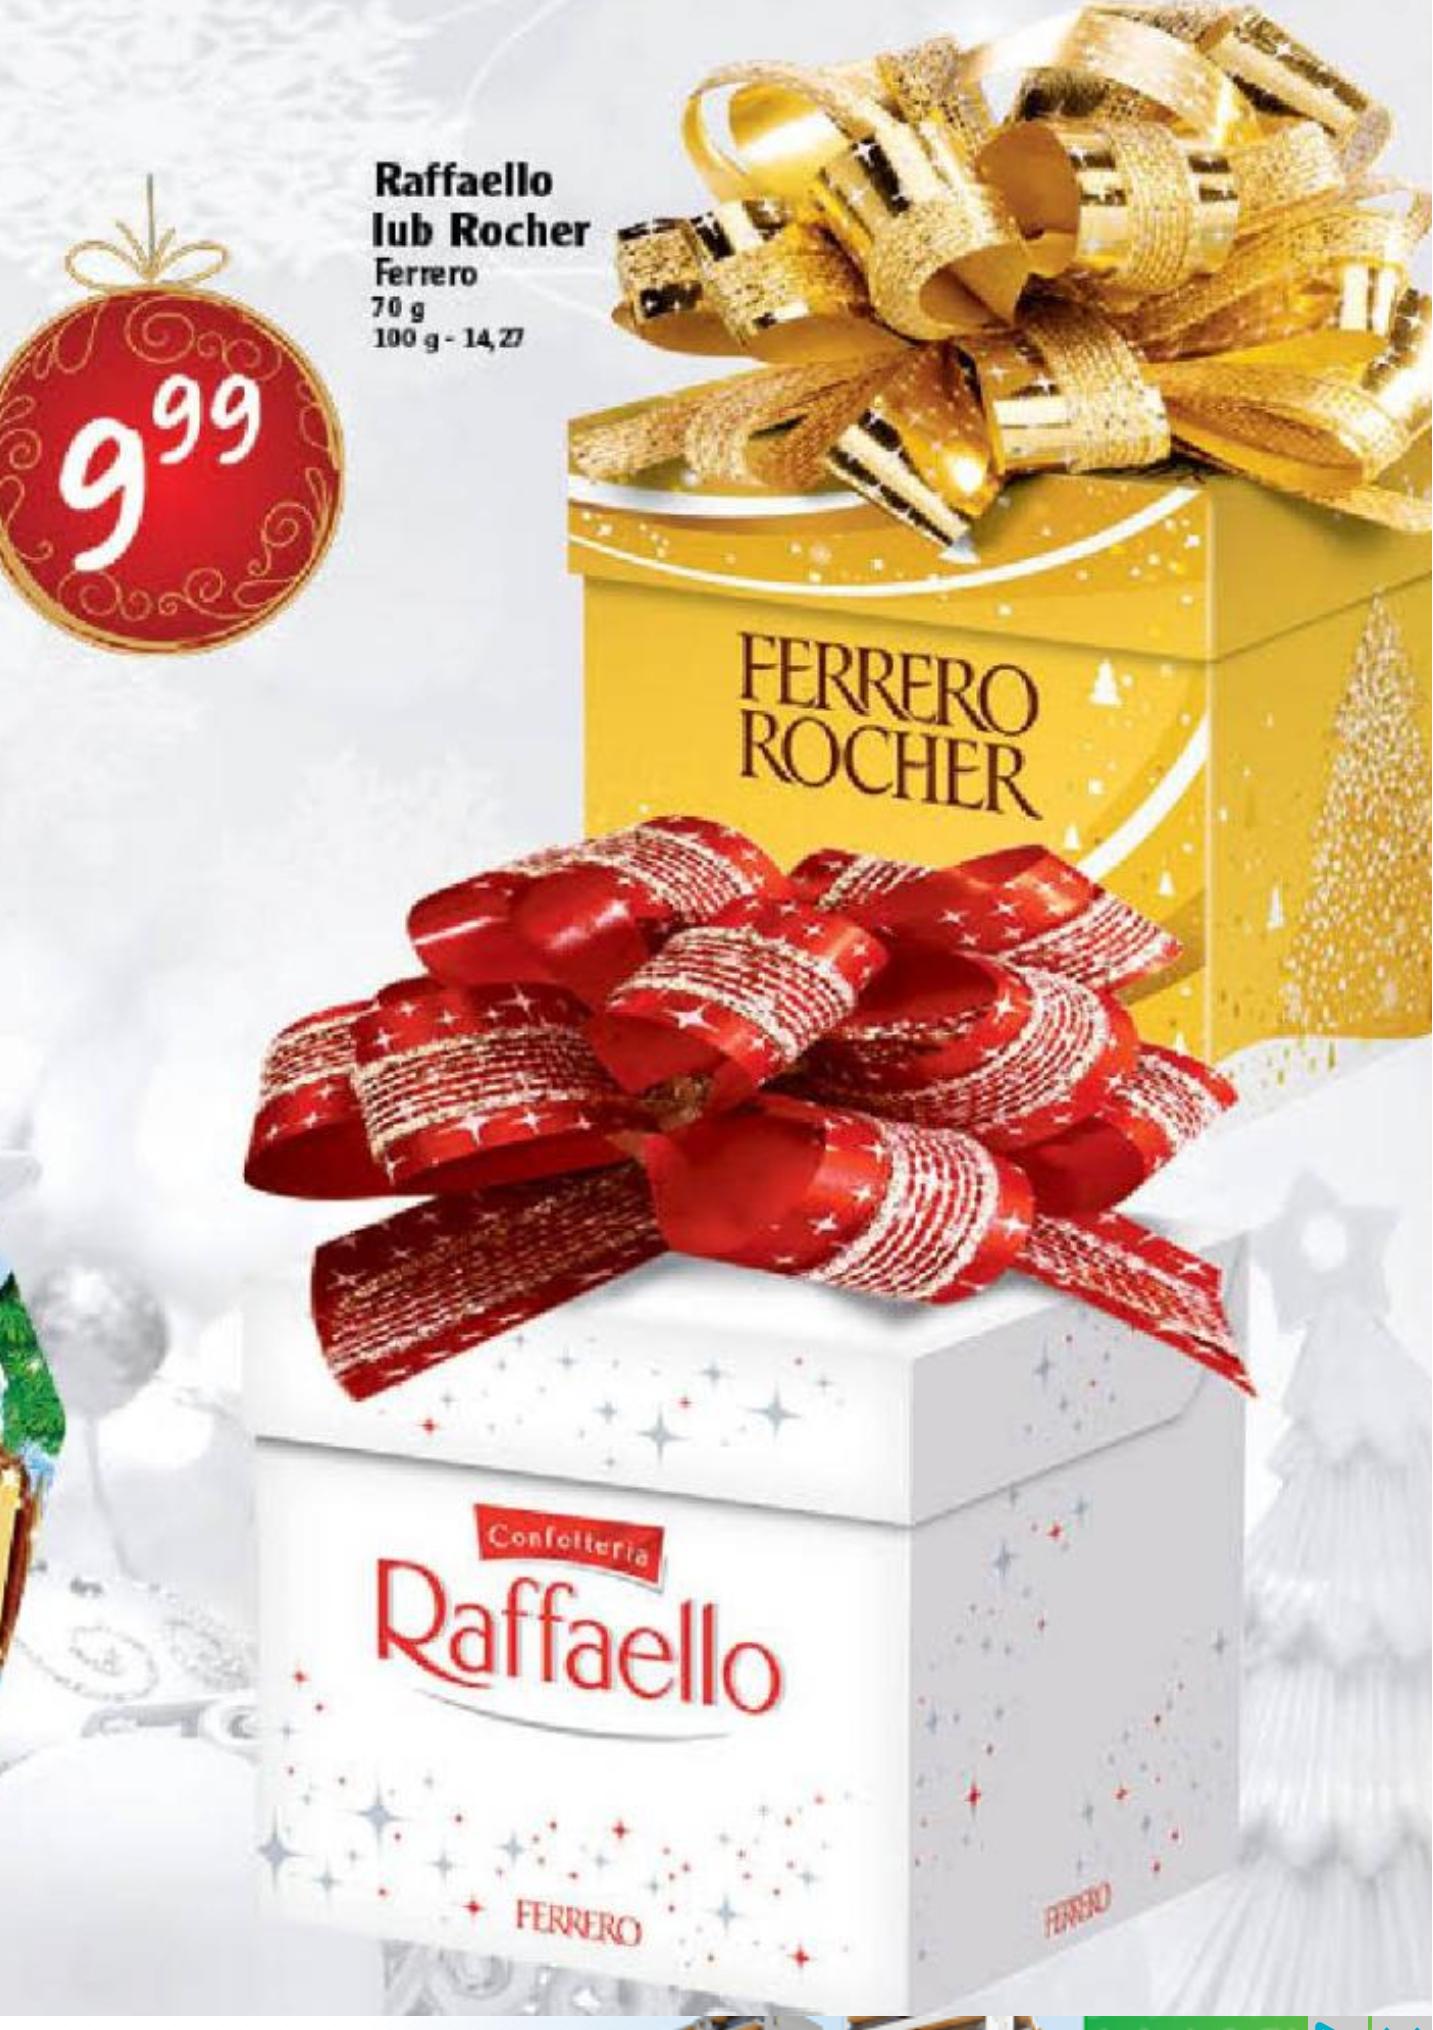 Raffaello POLOmarket